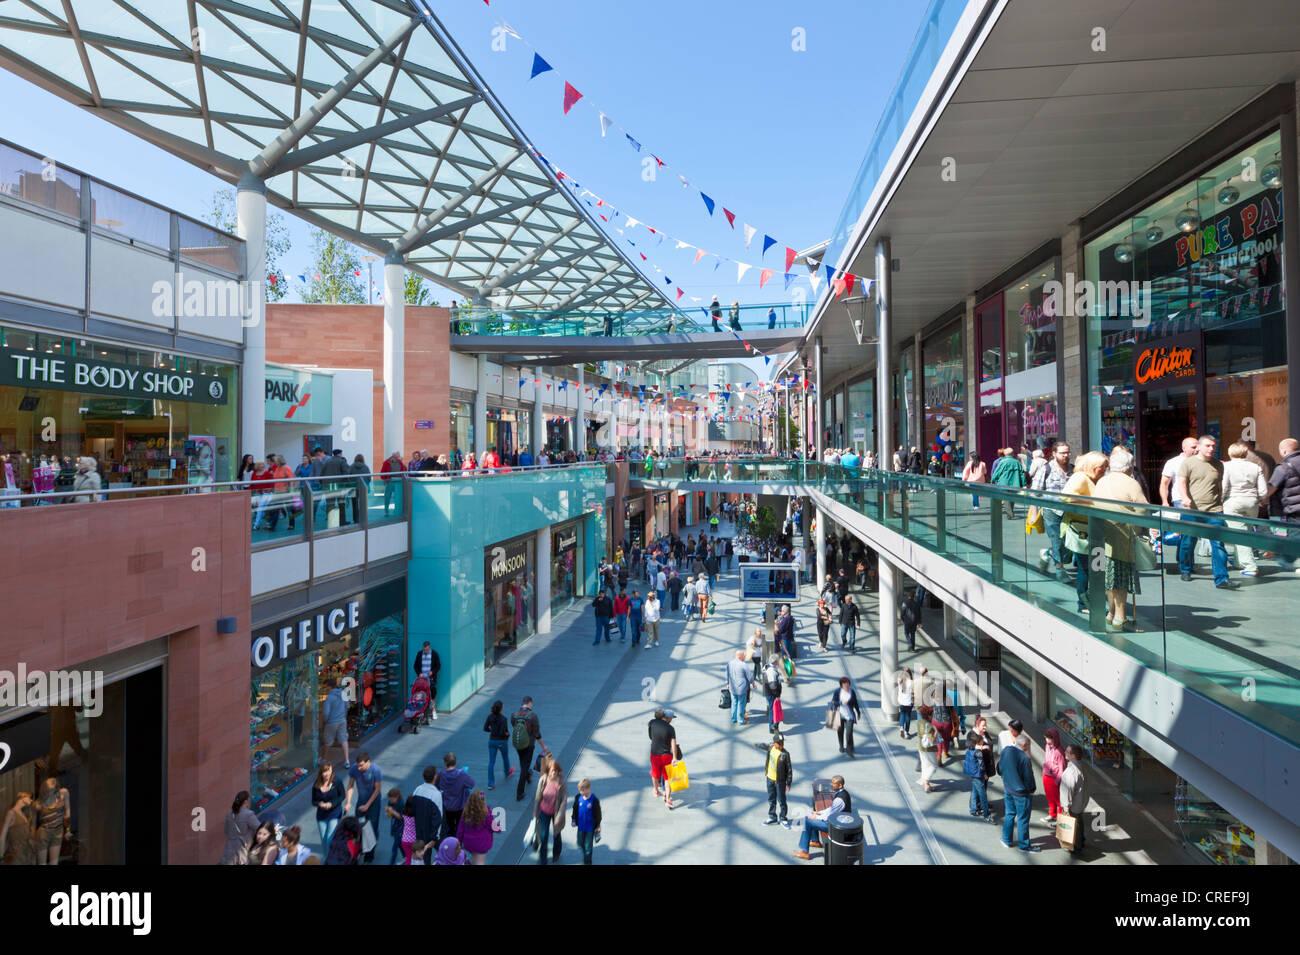 Liverpool One shopping centre mall city centre Liverpool Merseyside England UK GB EU Europe - Stock Image